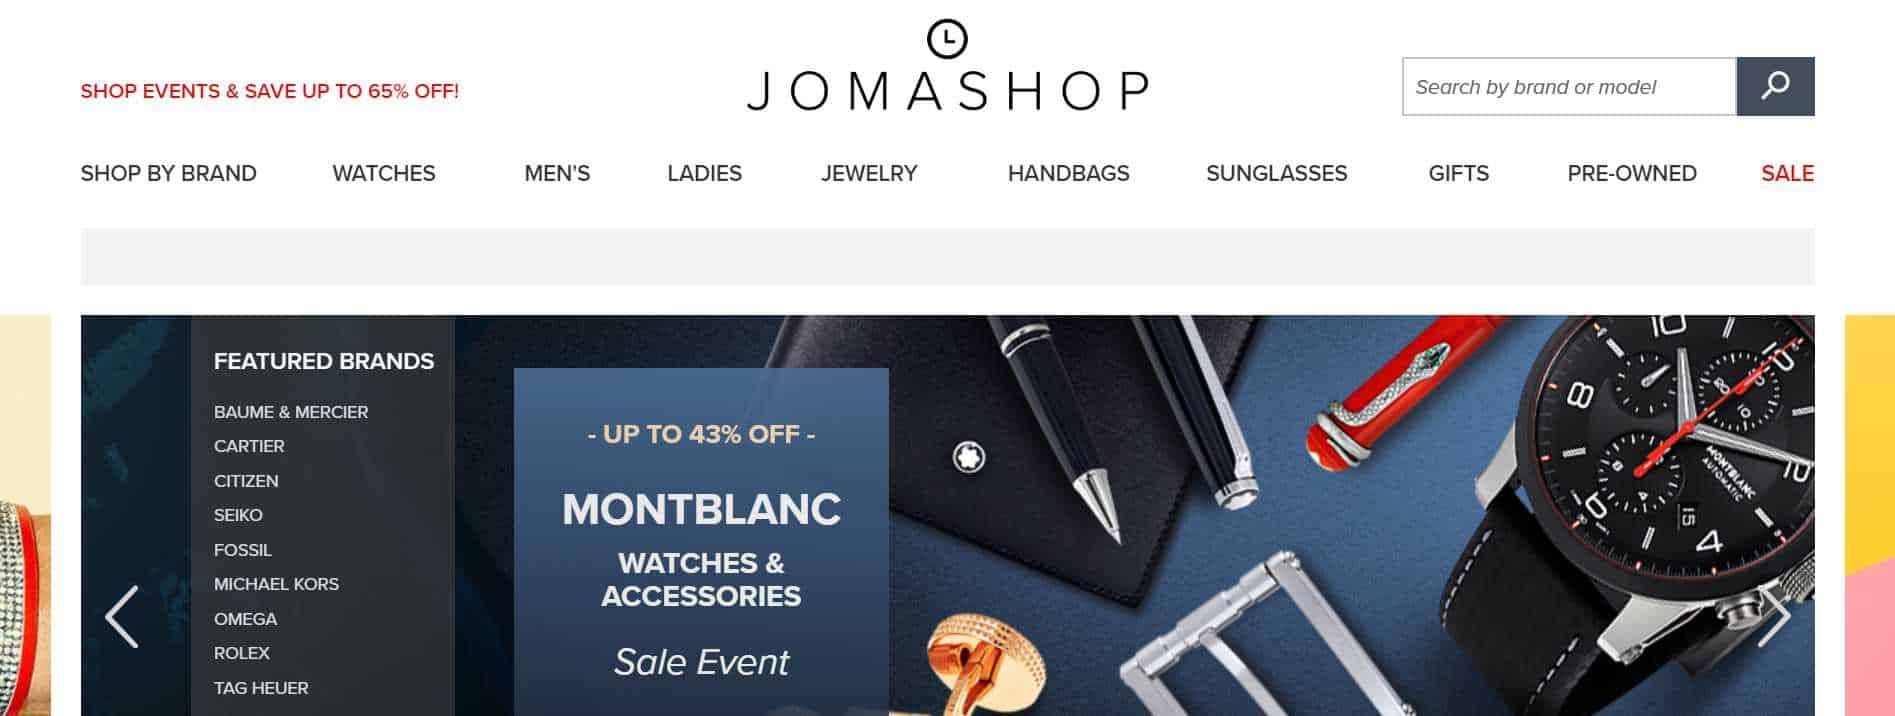 jomashop luxury watches black friday 2018